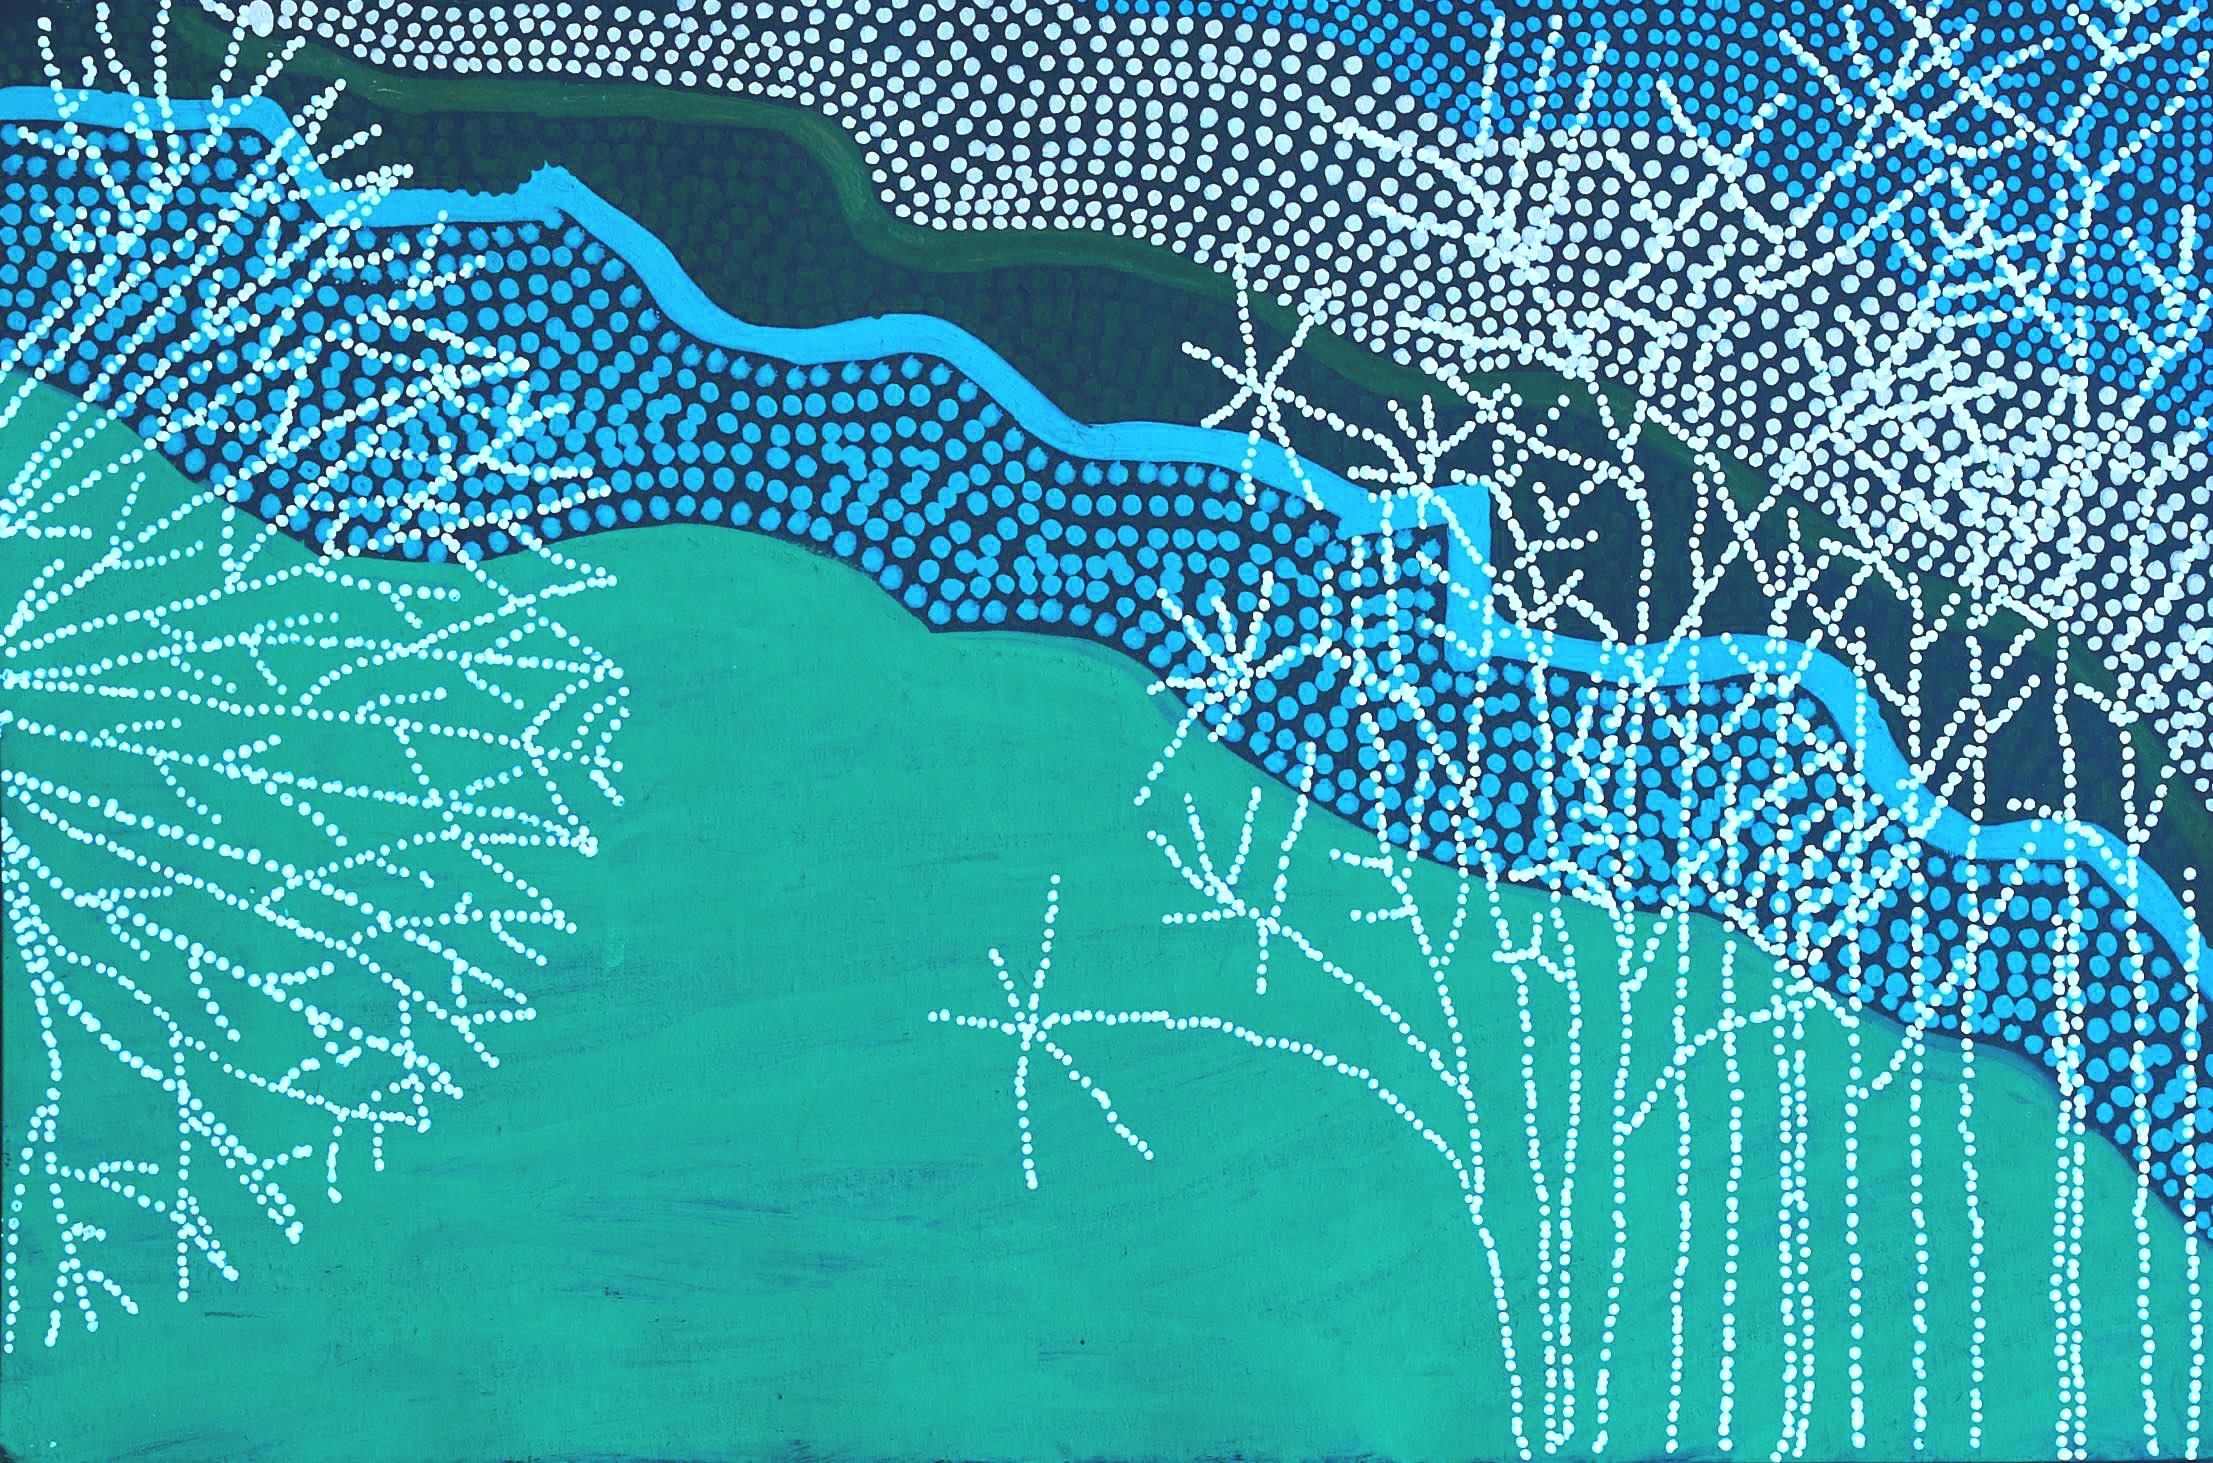 organic - work on paper; acrylic paint pens21cm x 14.8cmMarch 2018